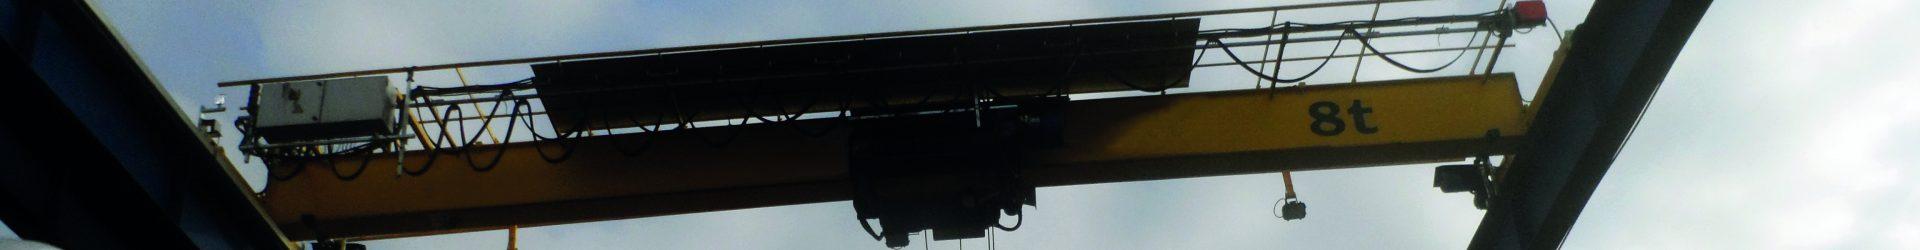 Pont Roulant Service